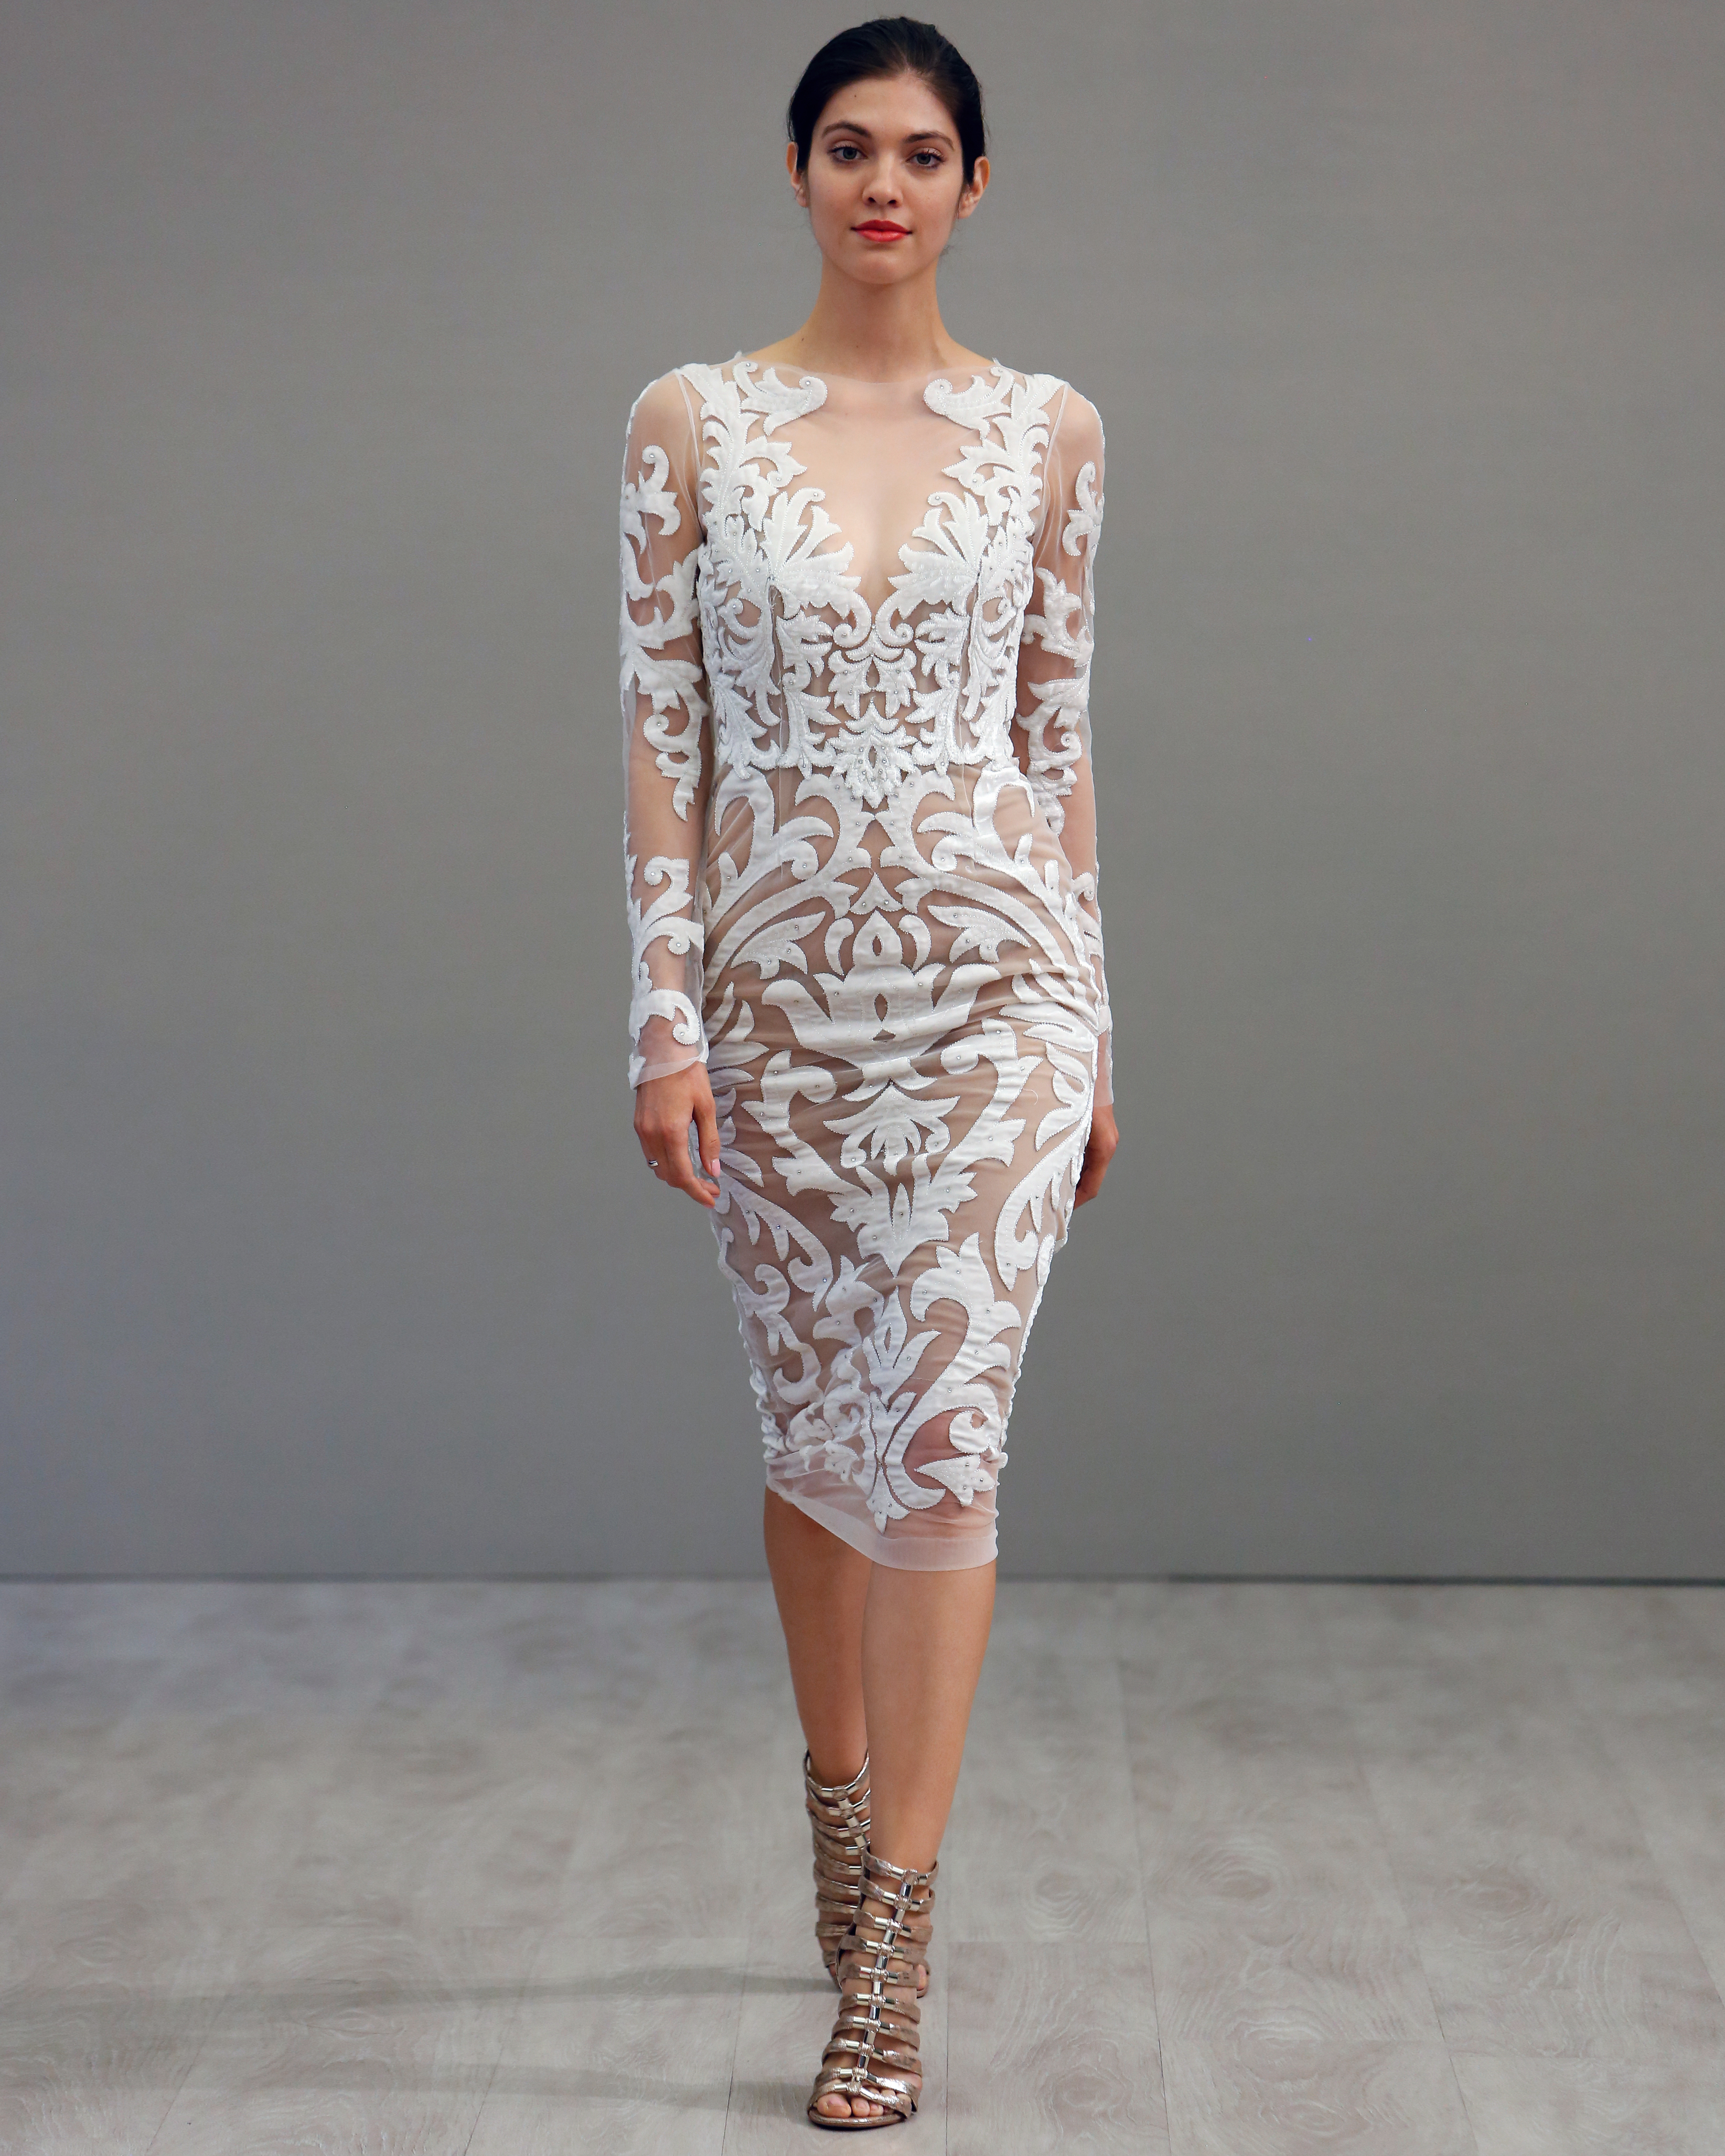 short-dresses-jlm-spring2016-wd112114-007-0515.jpg